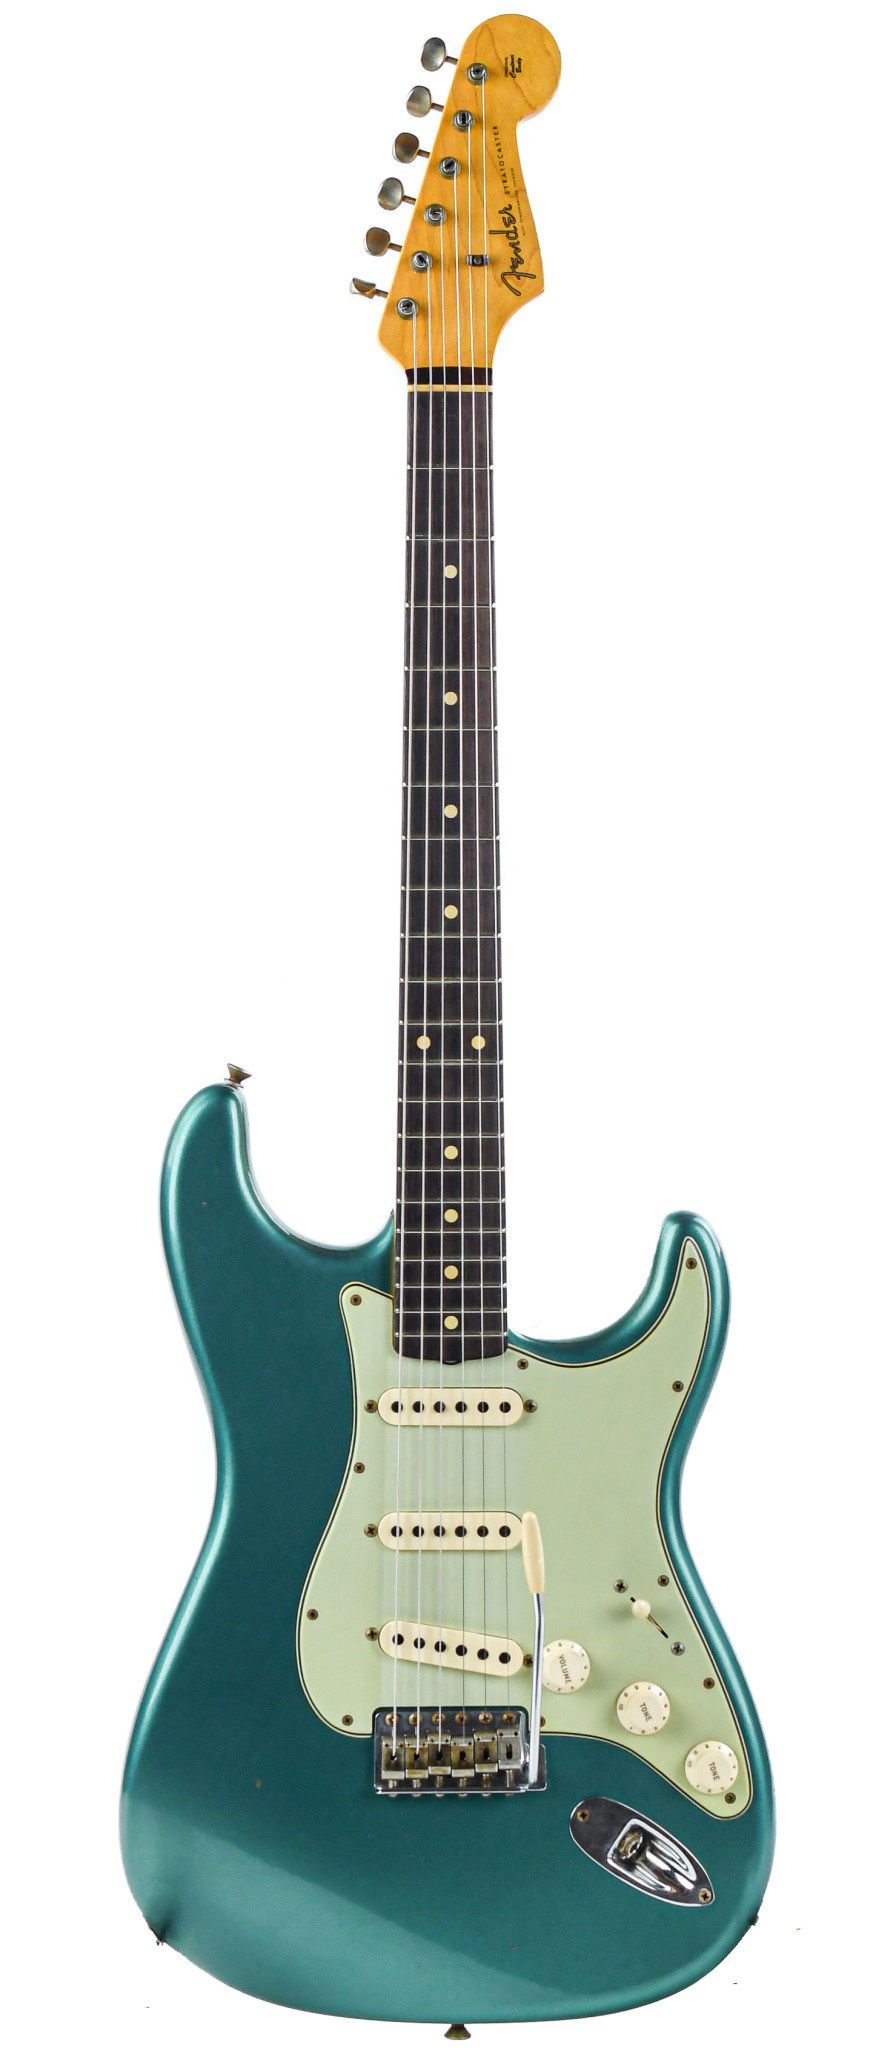 Fender Custom Shop '60s Stratocaster Relic Sherwood Metallic